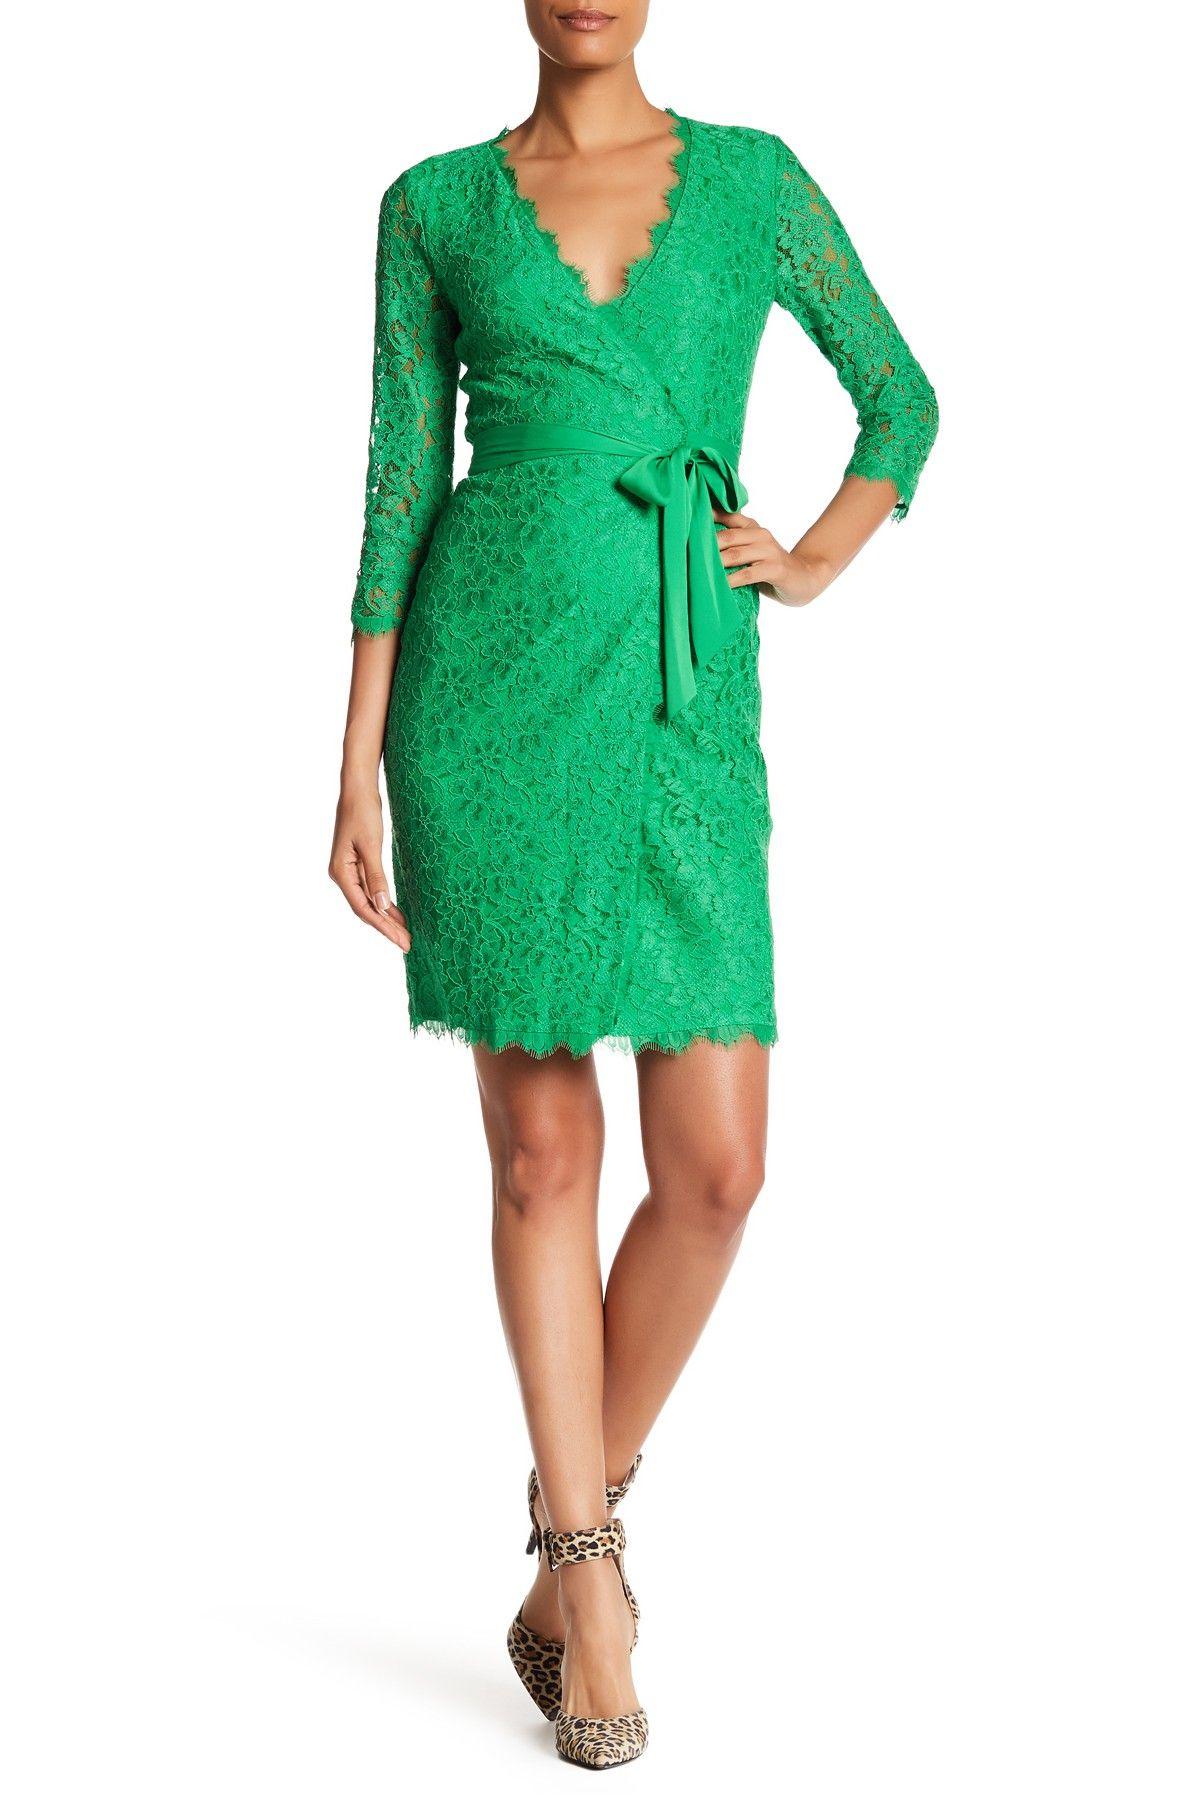 Julianna 3 4 Length Sleeve Wrap Dress By Diane Von Furstenberg On Nordstrom Rack Wrap Dress Lace Wrap Dress Dresses [ 1800 x 1200 Pixel ]